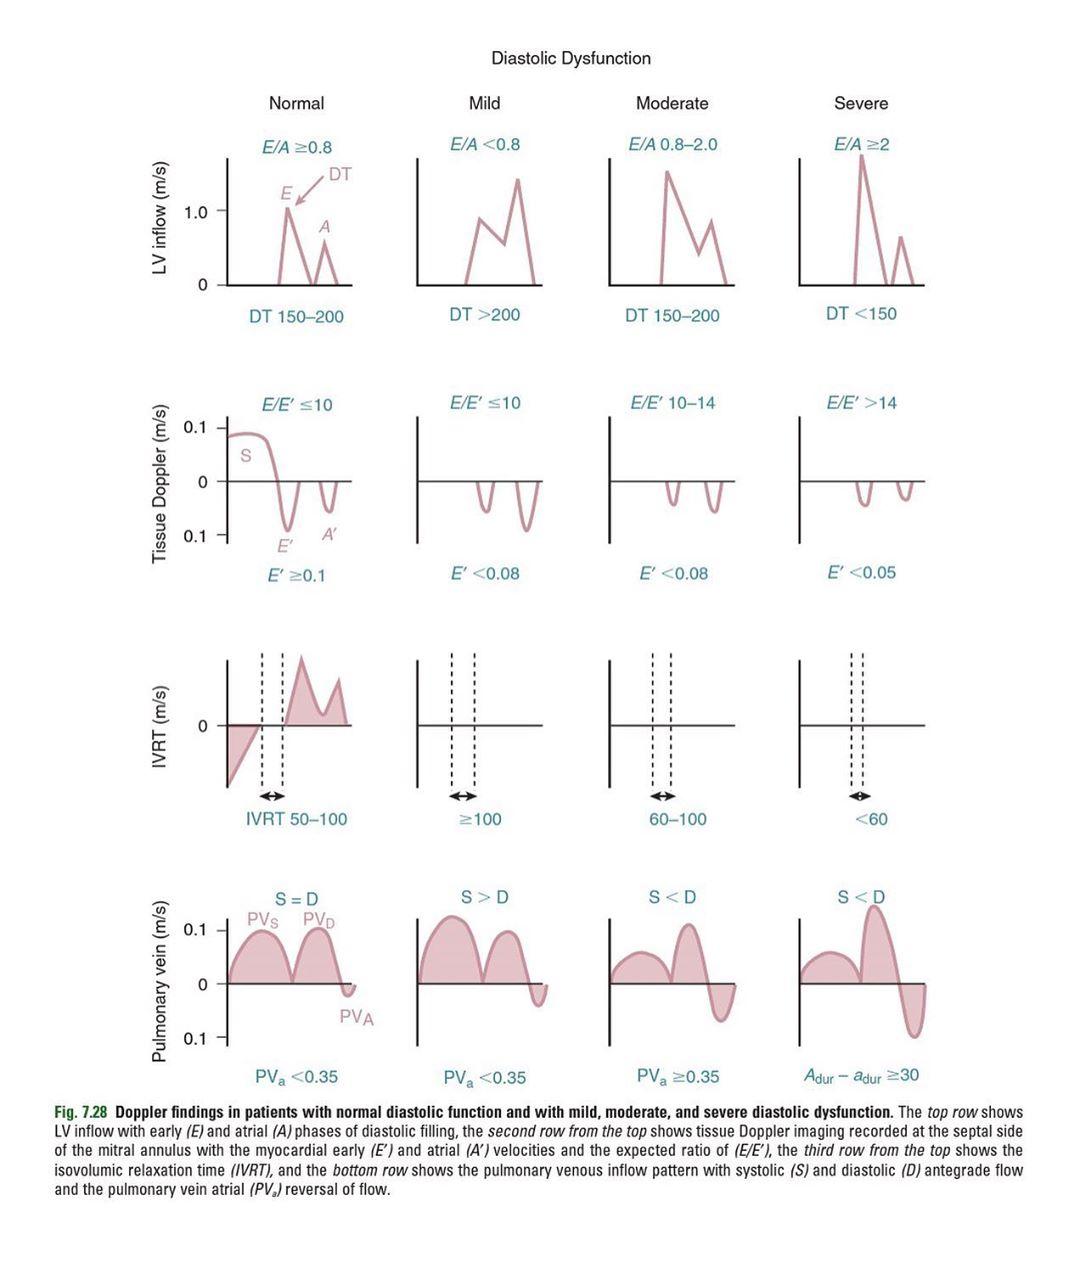 Diastolic Dysfunction Assessment - Normal, Mild, Moderate ...